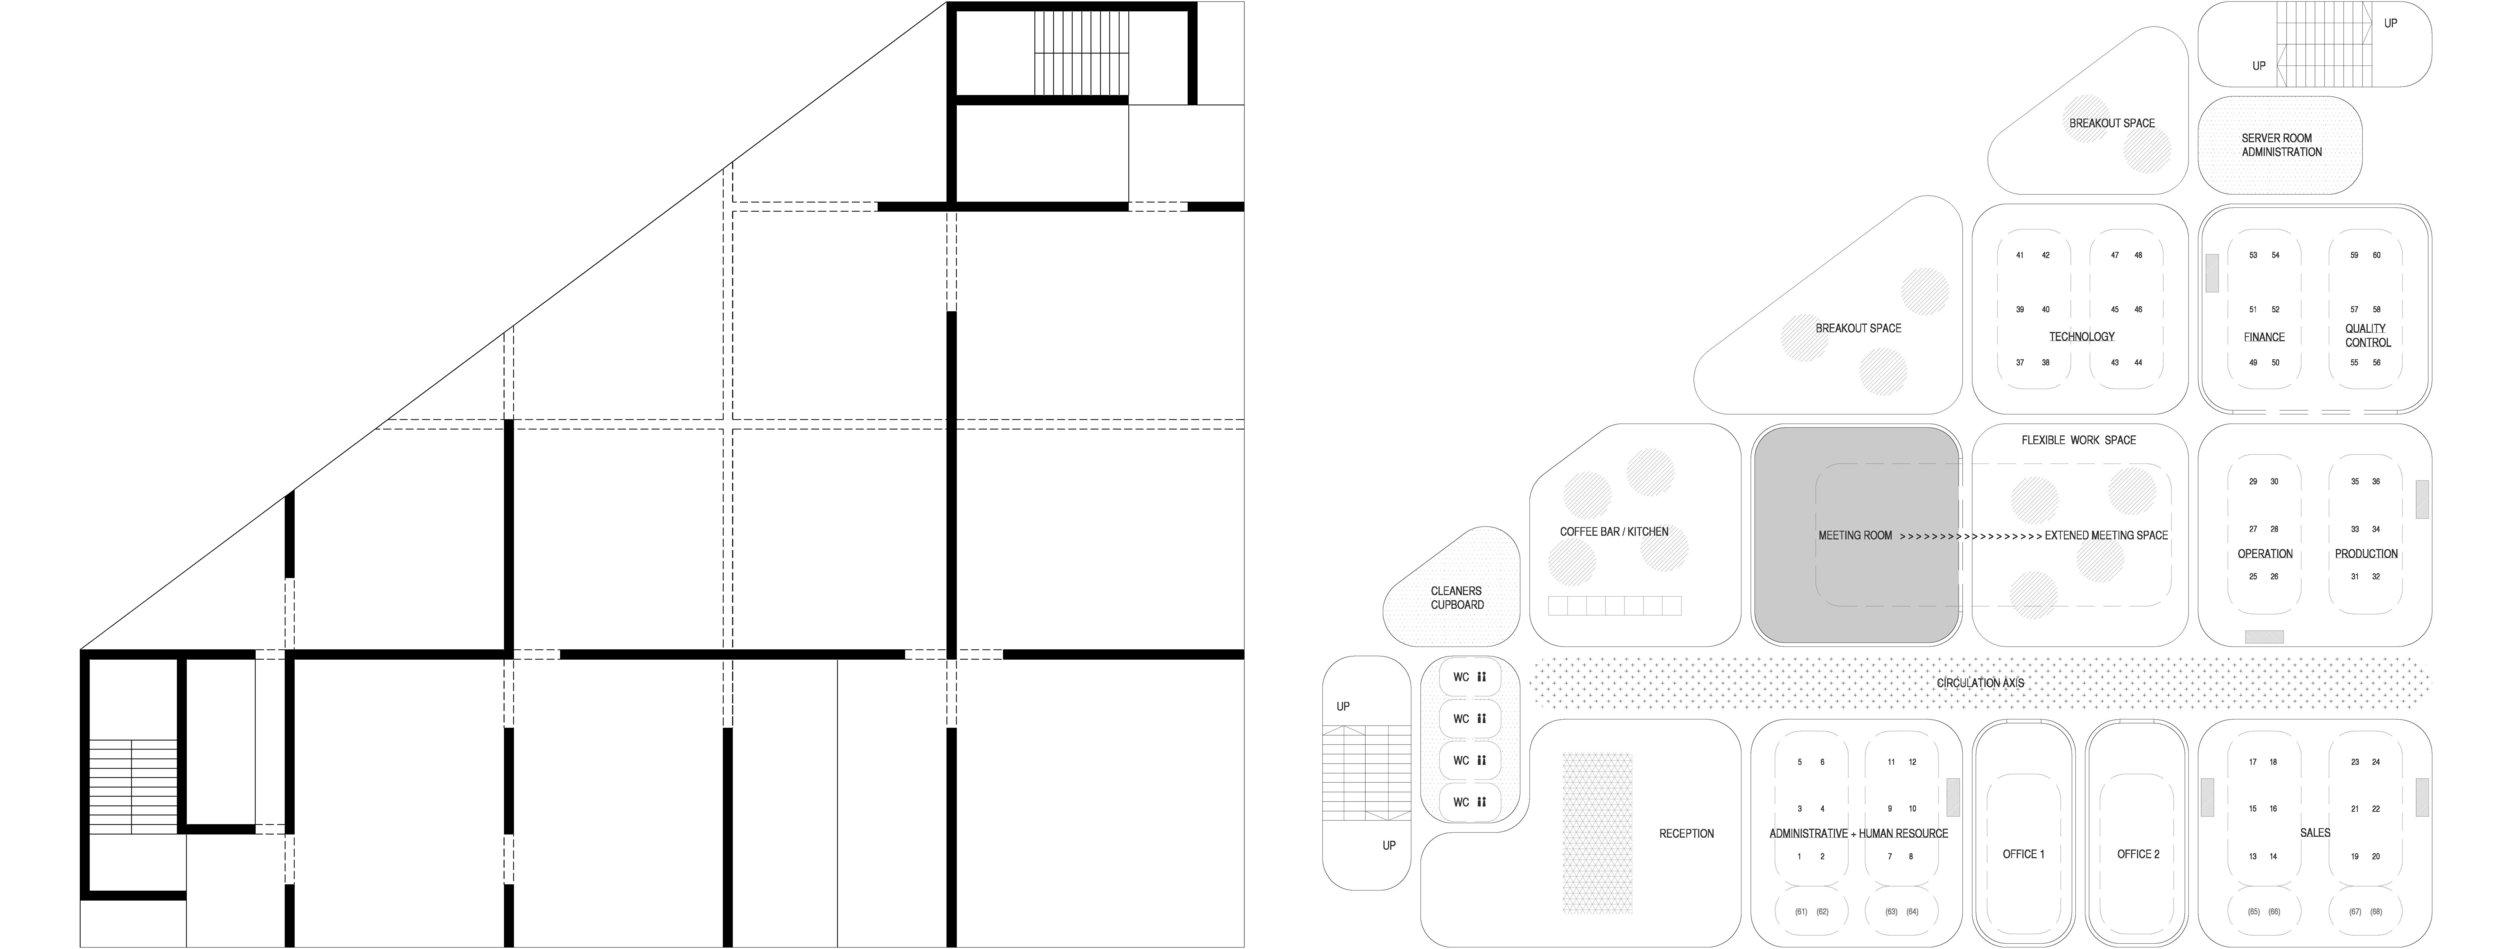 MOCT_workplace_china_drawing06.jpg